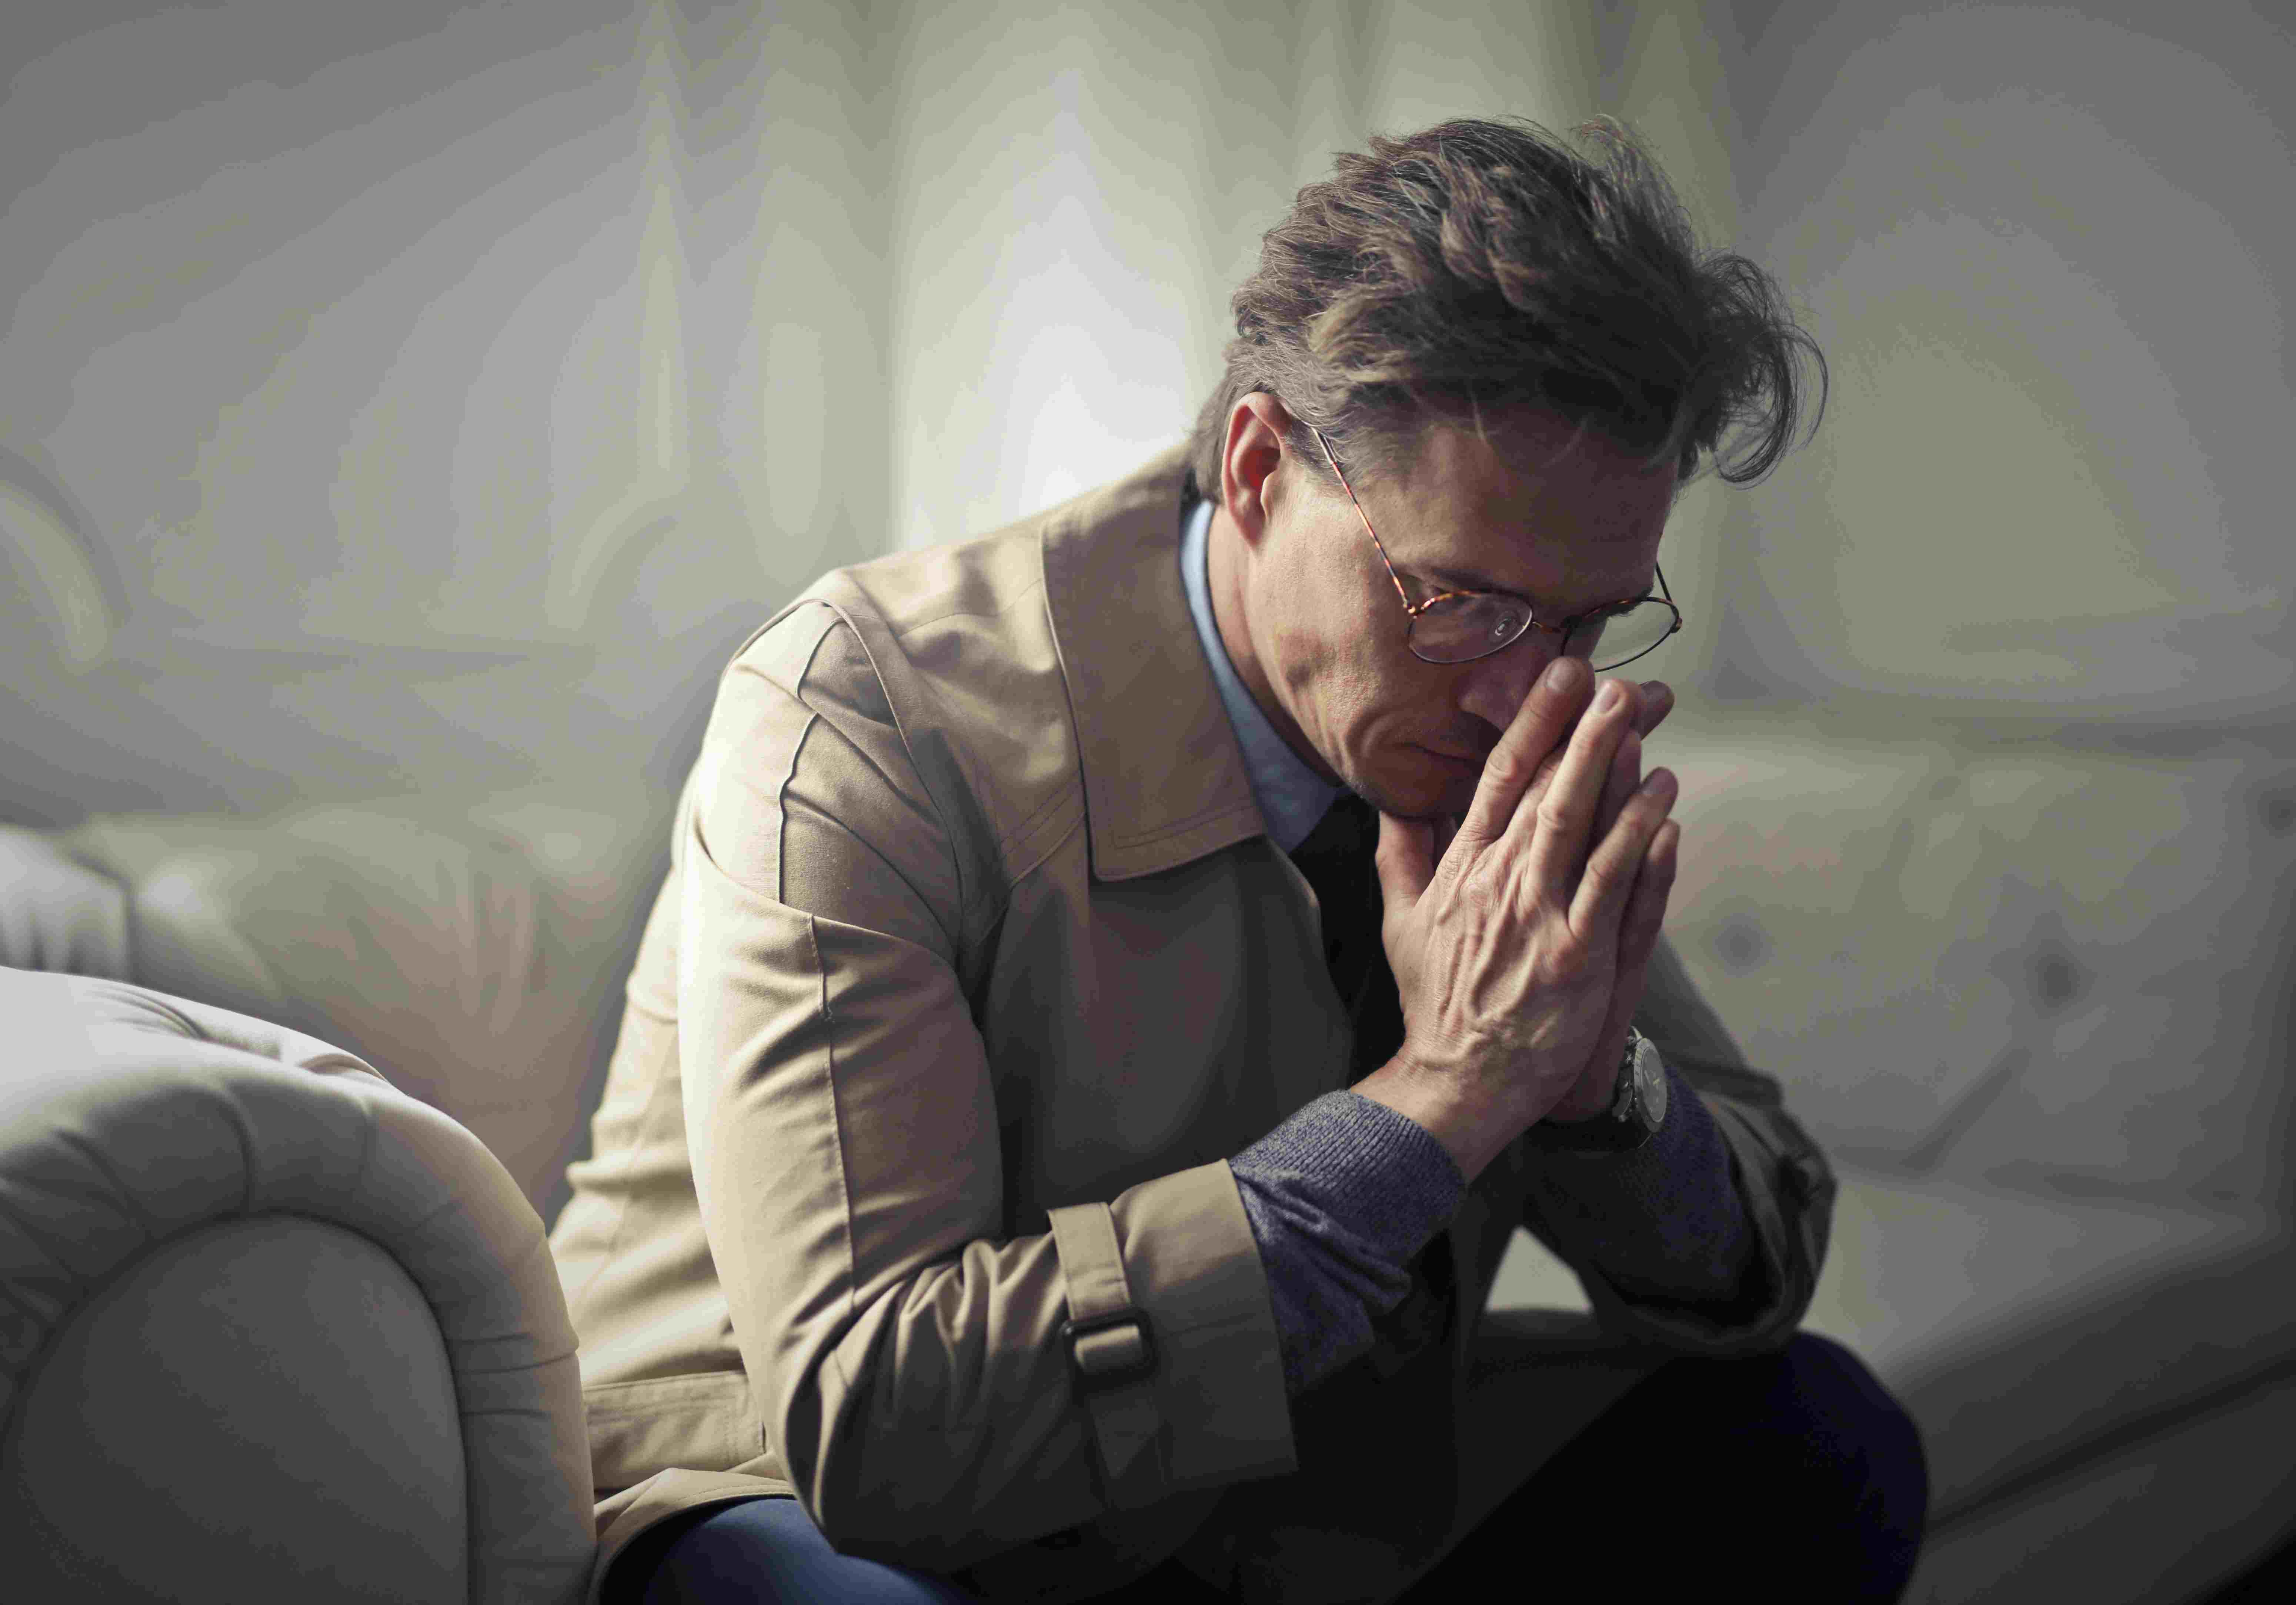 a sad depressed man thinking deeply